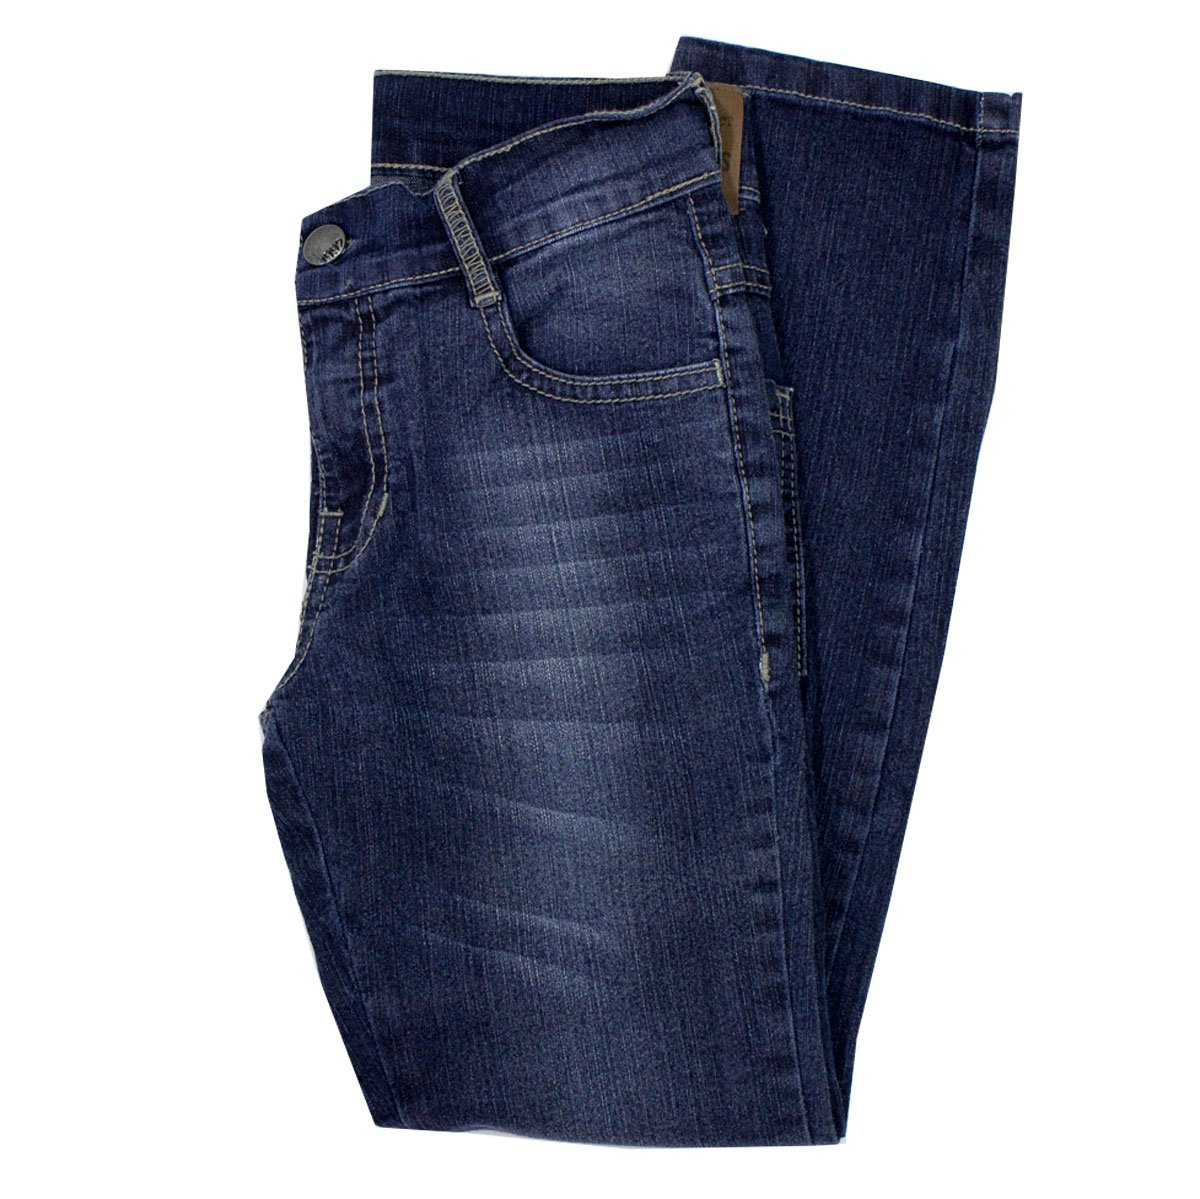 95348c988 Bizz Store - Calça Jeans Infantil Menino Hering Kids